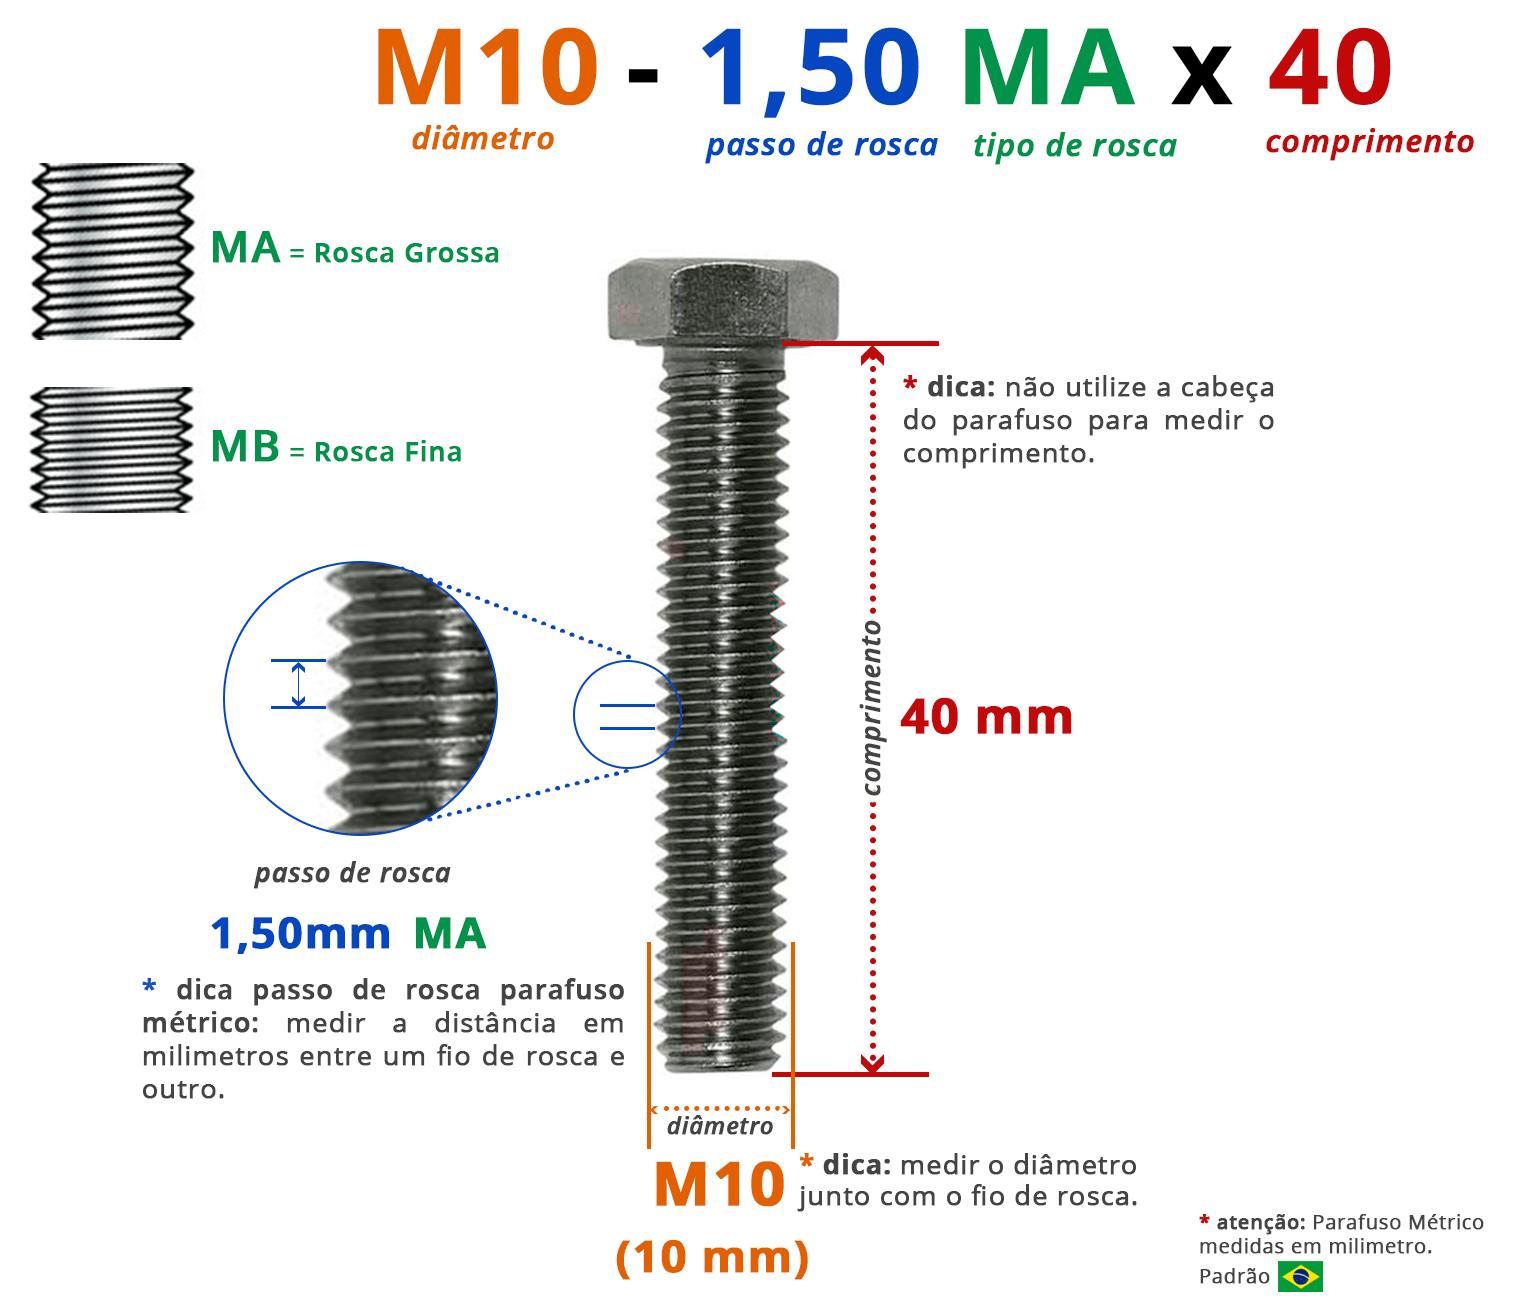 PARAFUSO SEXTAVADO ROSCA INTEIRA M10 1,50 MA X 40 DIN 933 INOX A4